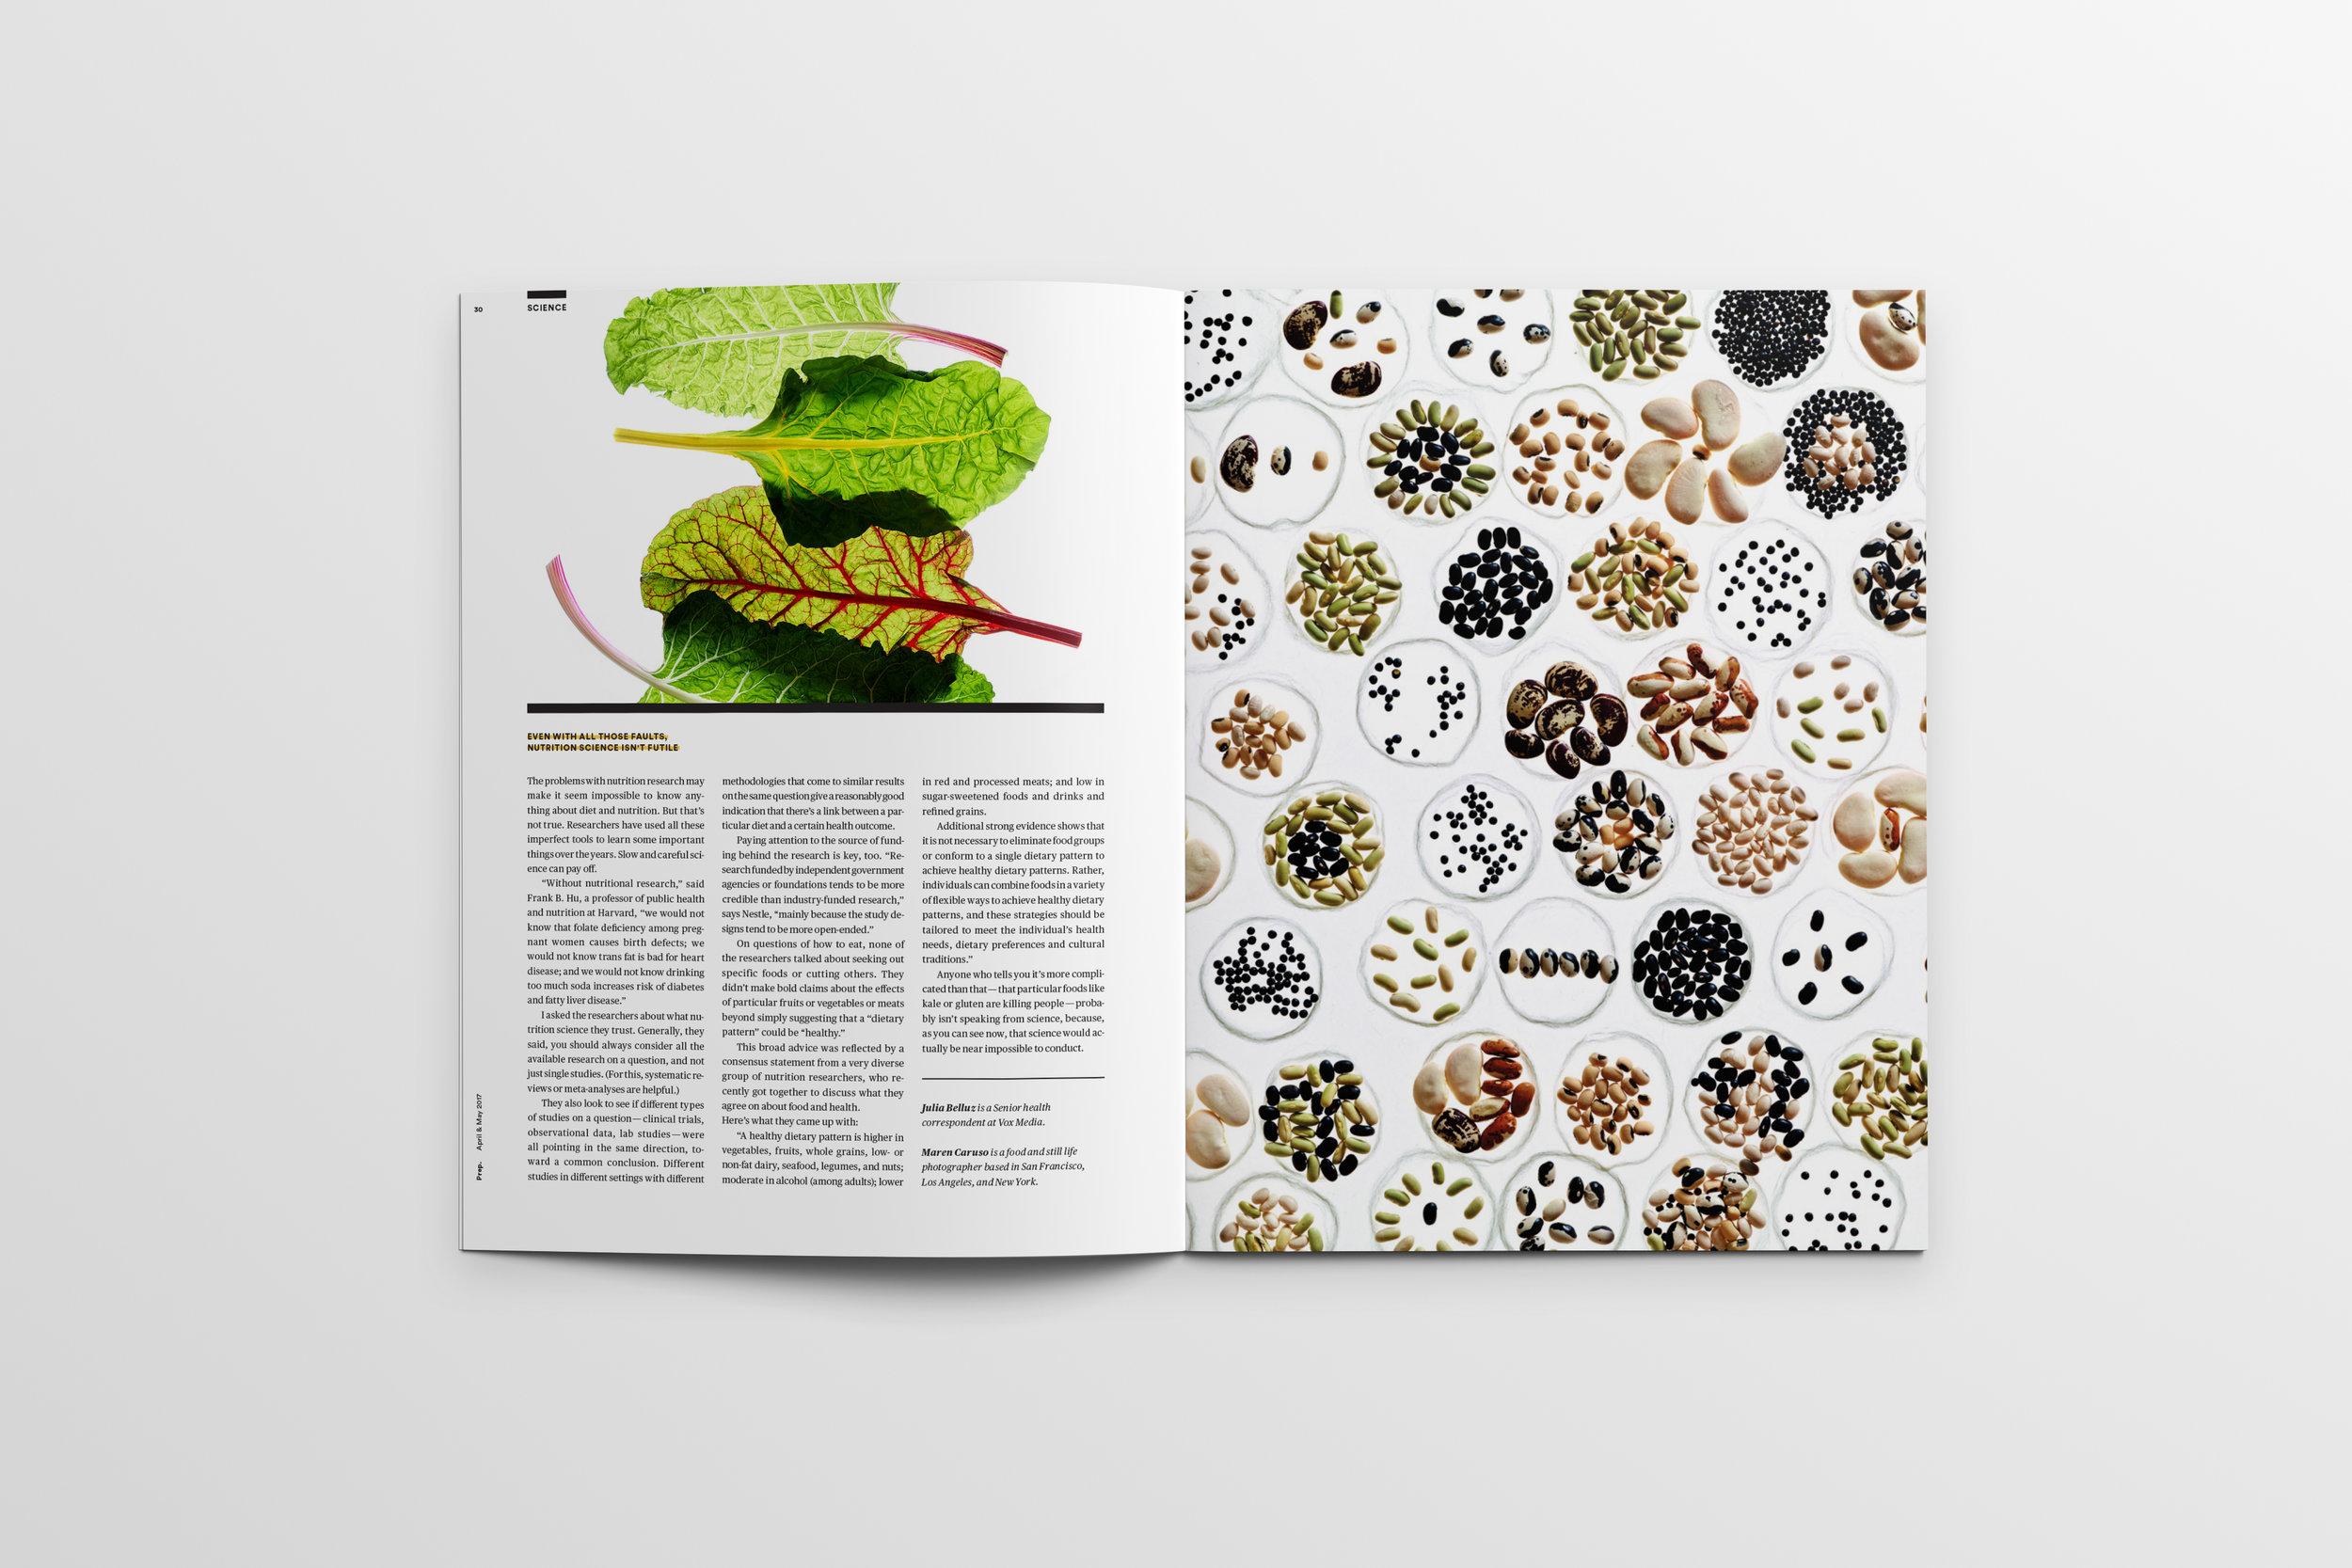 Magazine_Mockup_Pages30-31.jpg